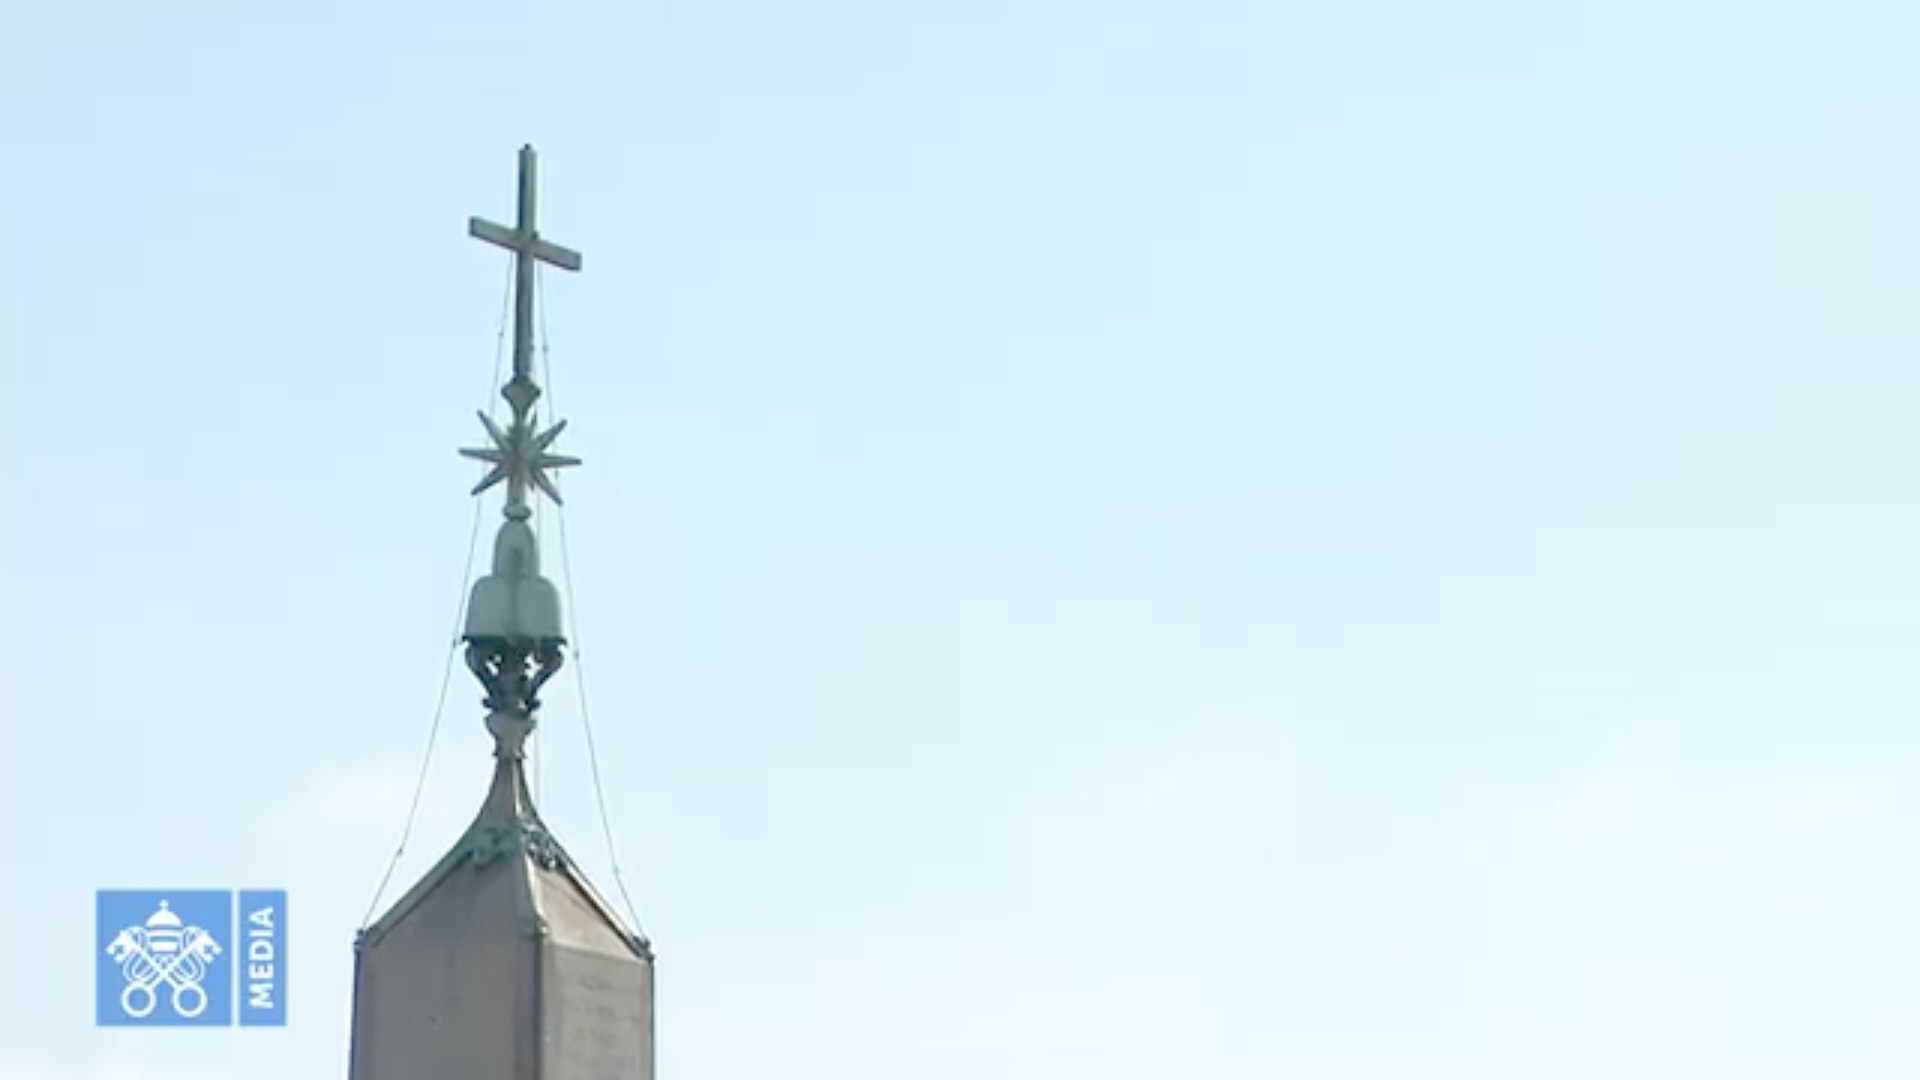 Croix de l'obélisque, Pl. Saint-Pierre, 1er nov. 2020, capture @Vatican Media